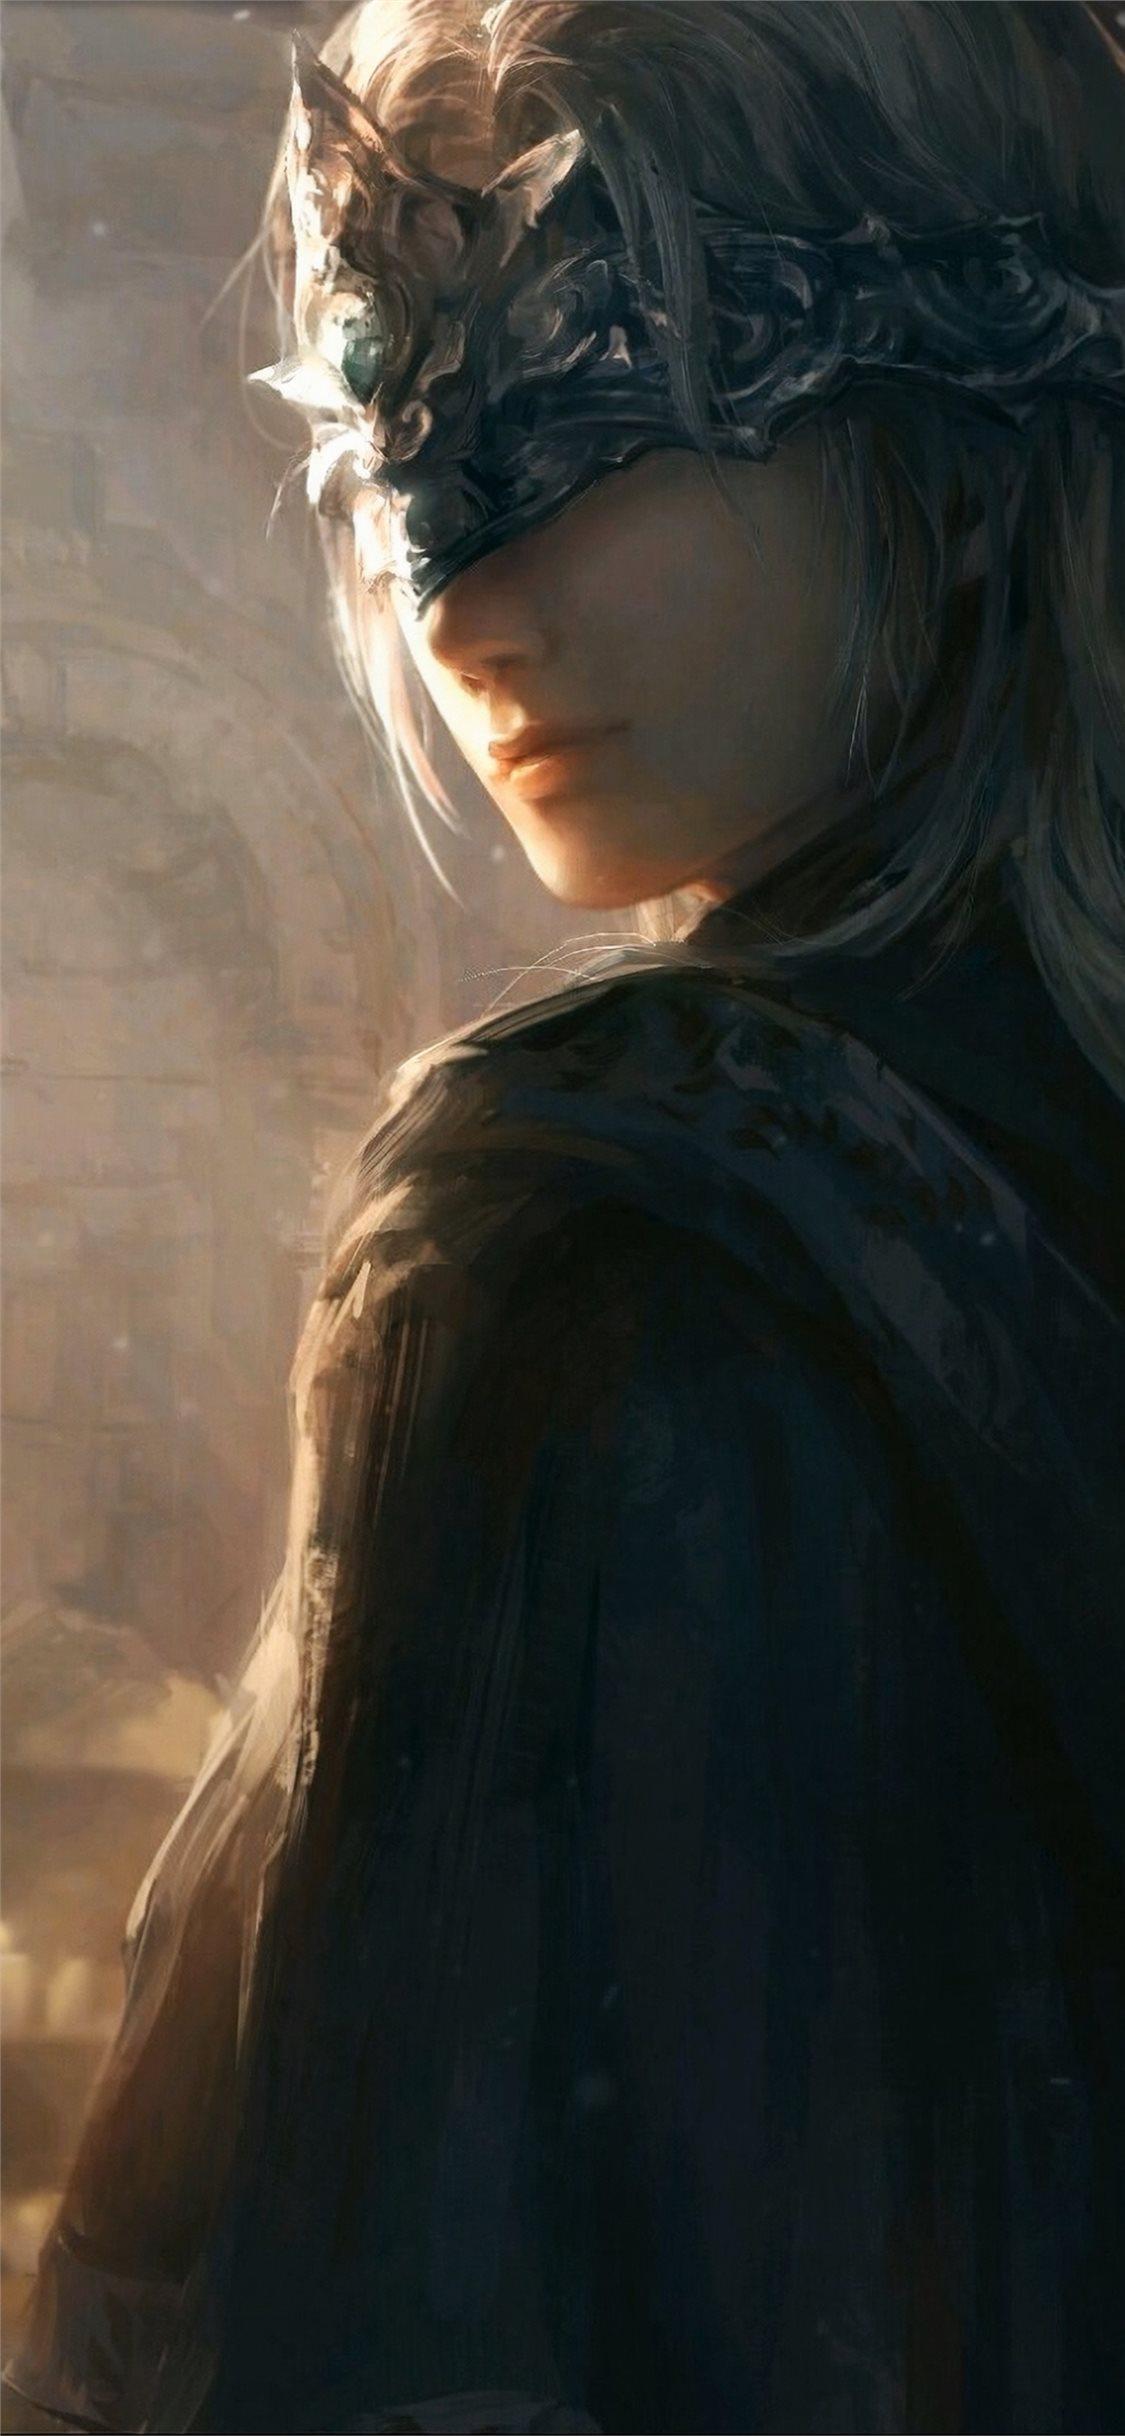 dark souls girl 4k iPhone X Wallpapers